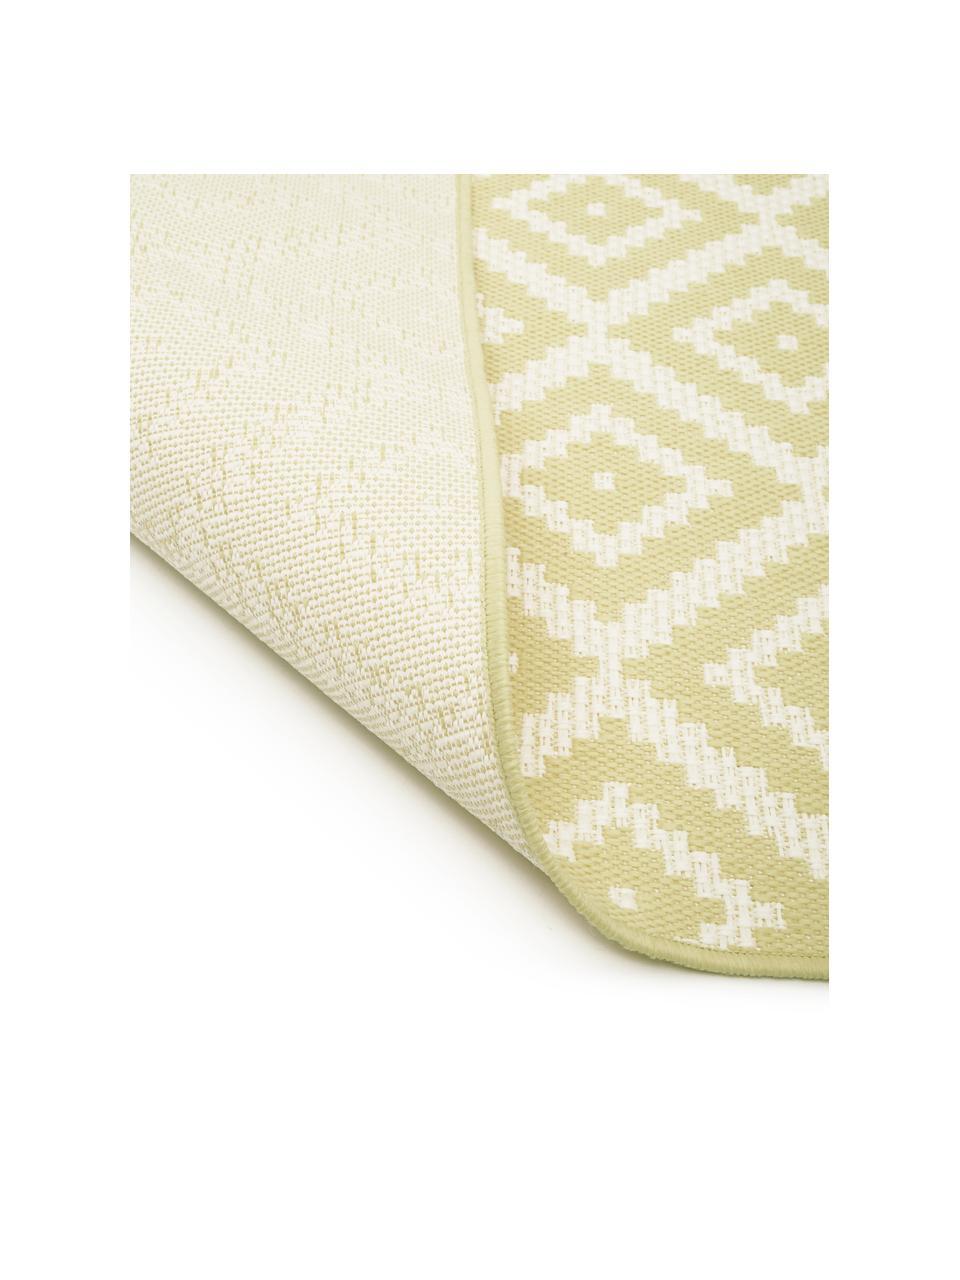 In- & outdoor vloerkleed met patroon Miami in geel/wit, 86% polypropyleen, 14% polyester, Wit, geel, B 200 x L 290 cm (maat L)